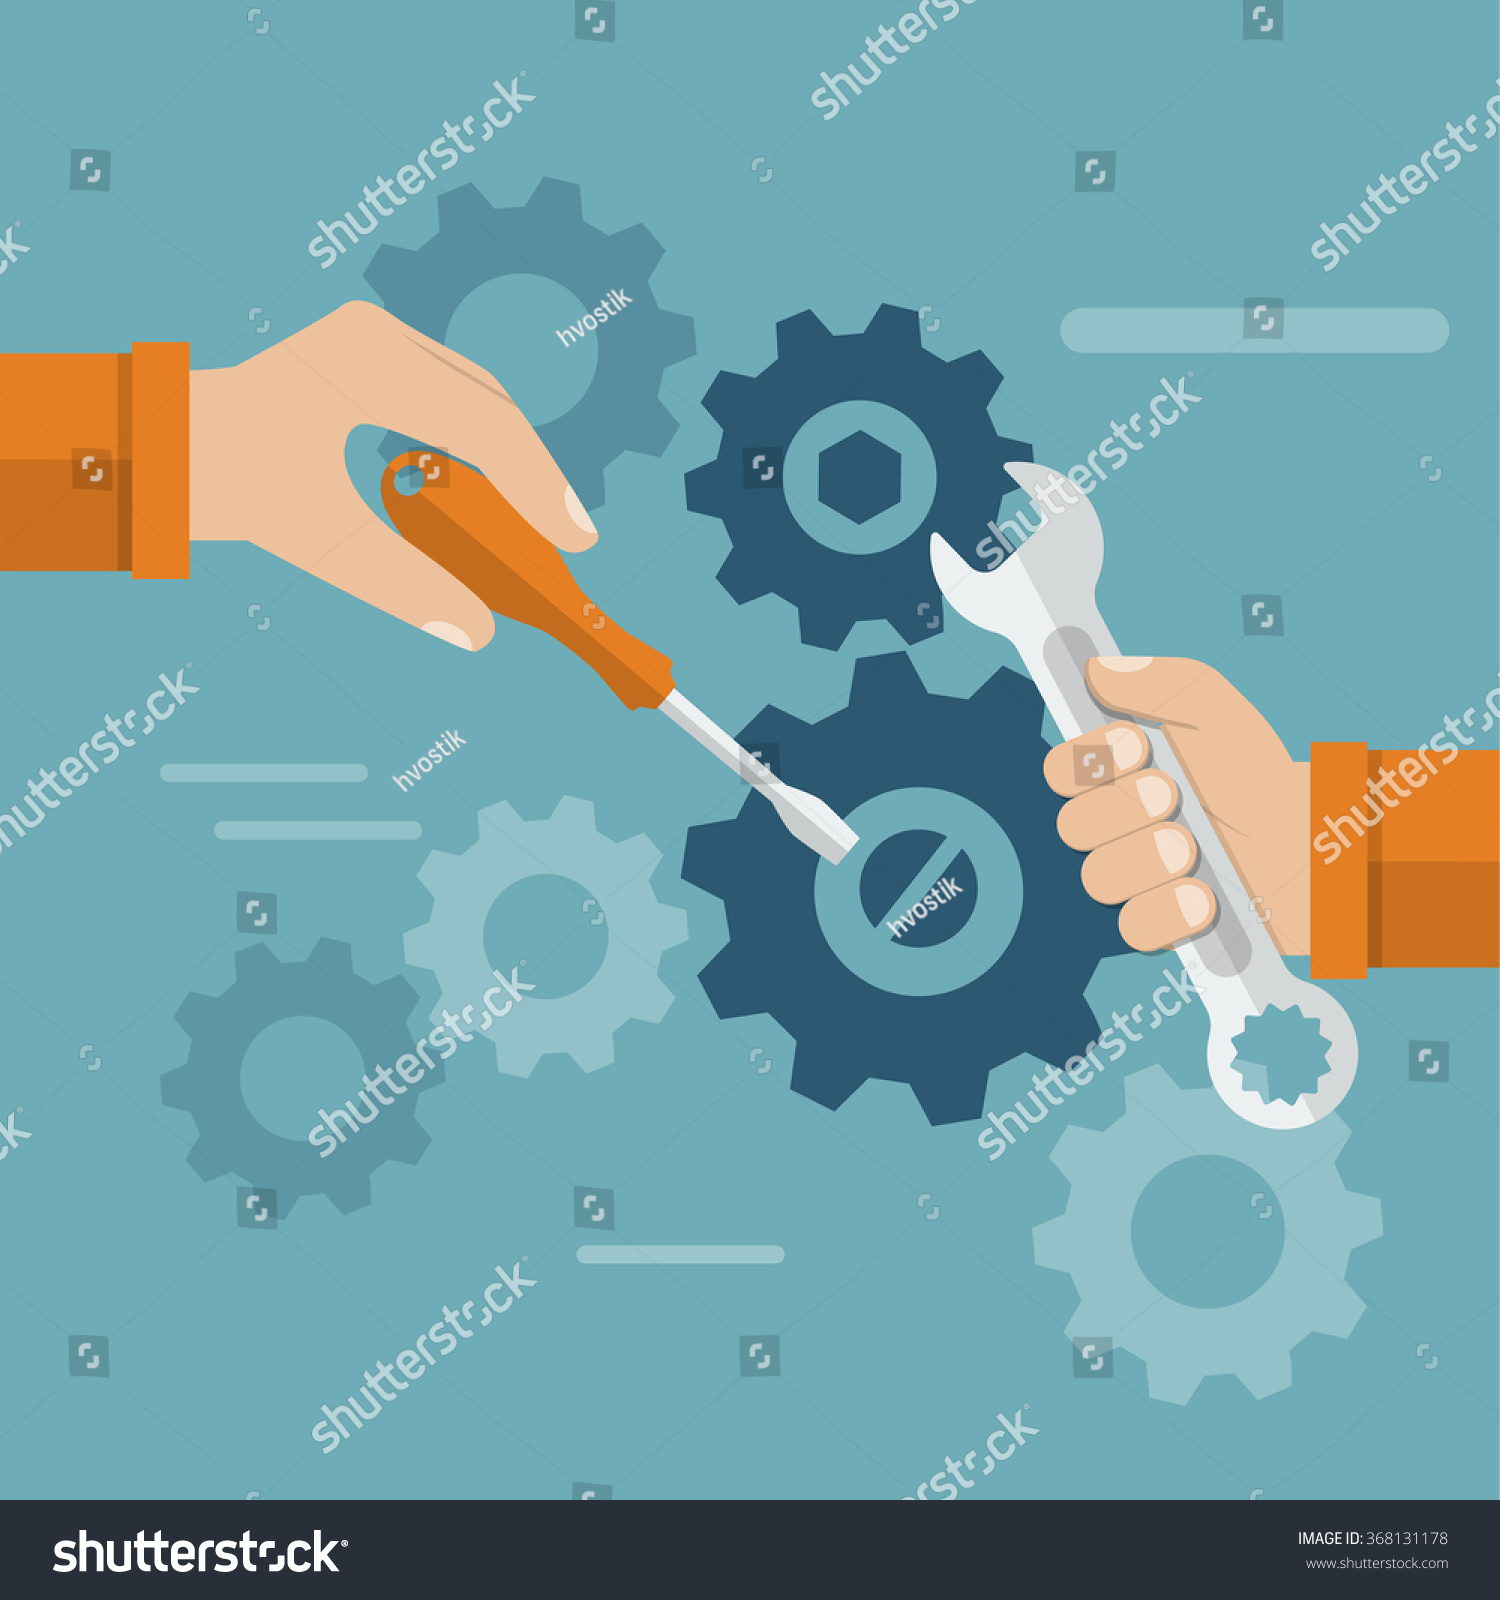 teamwork hands team tool repair mechanism stock vector 368131178 teamwork hands team a tool to repair mechanism sleek design vector illustration